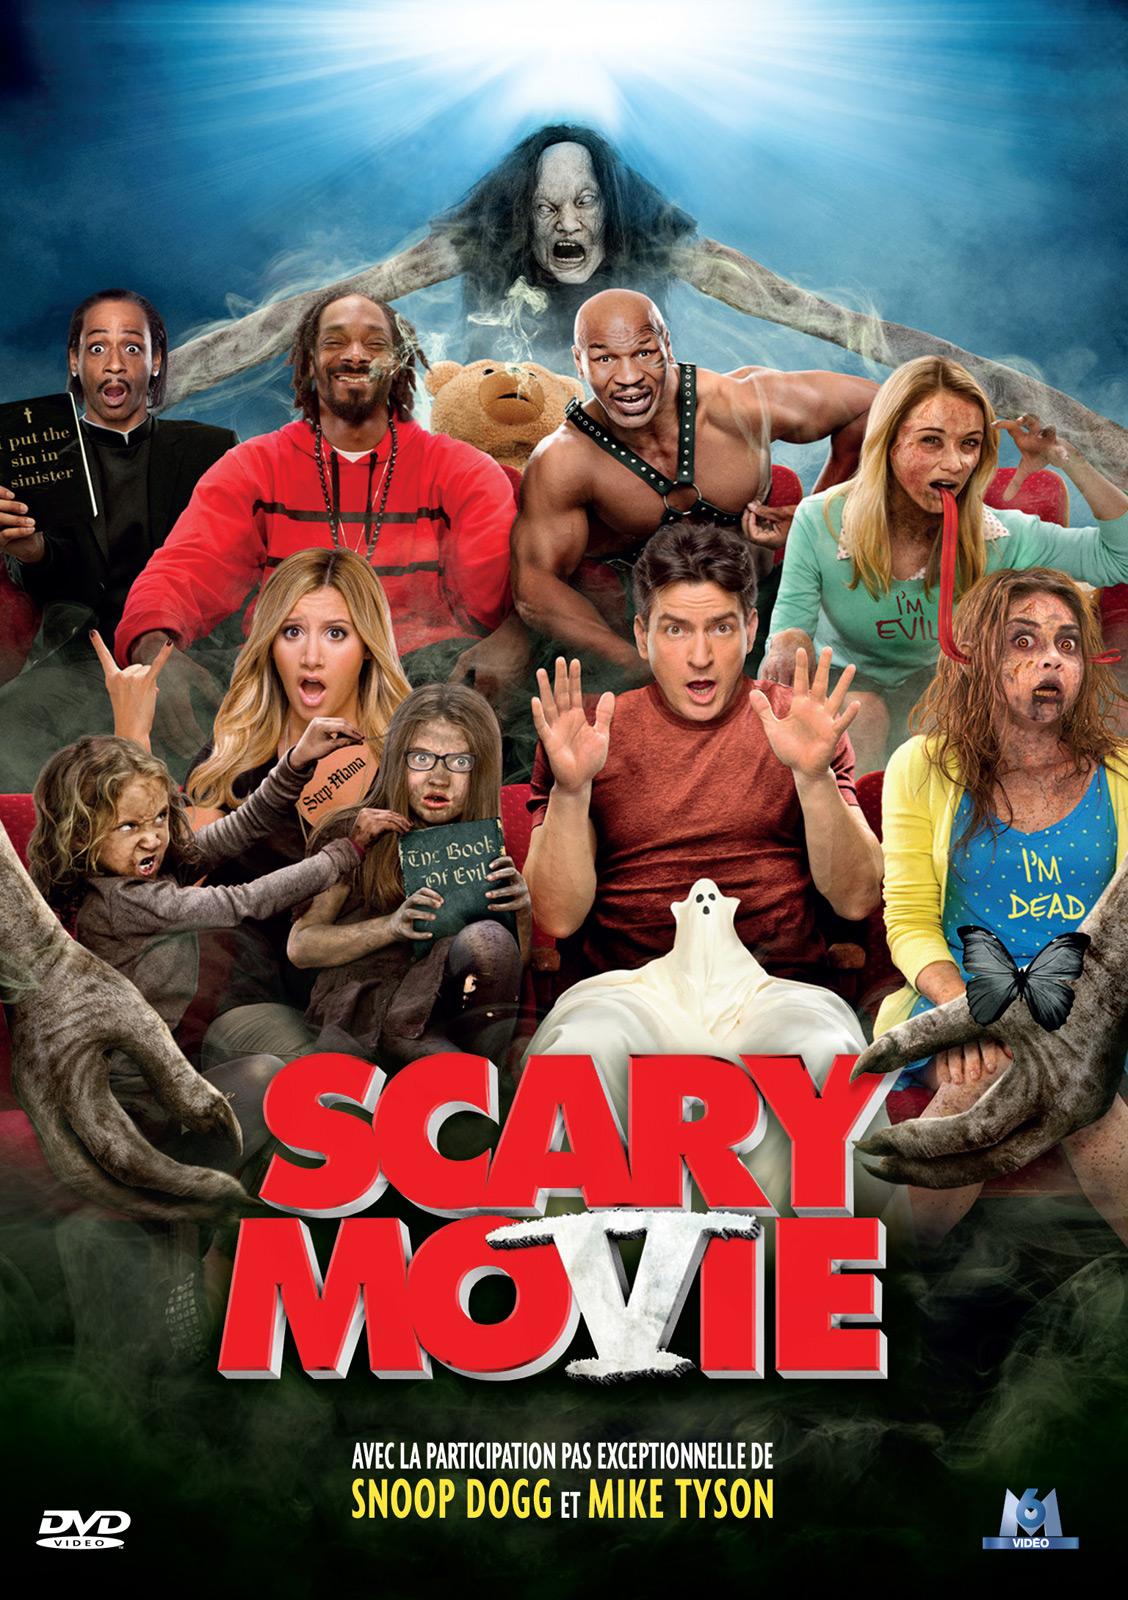 affiche du film Scary Movie 5